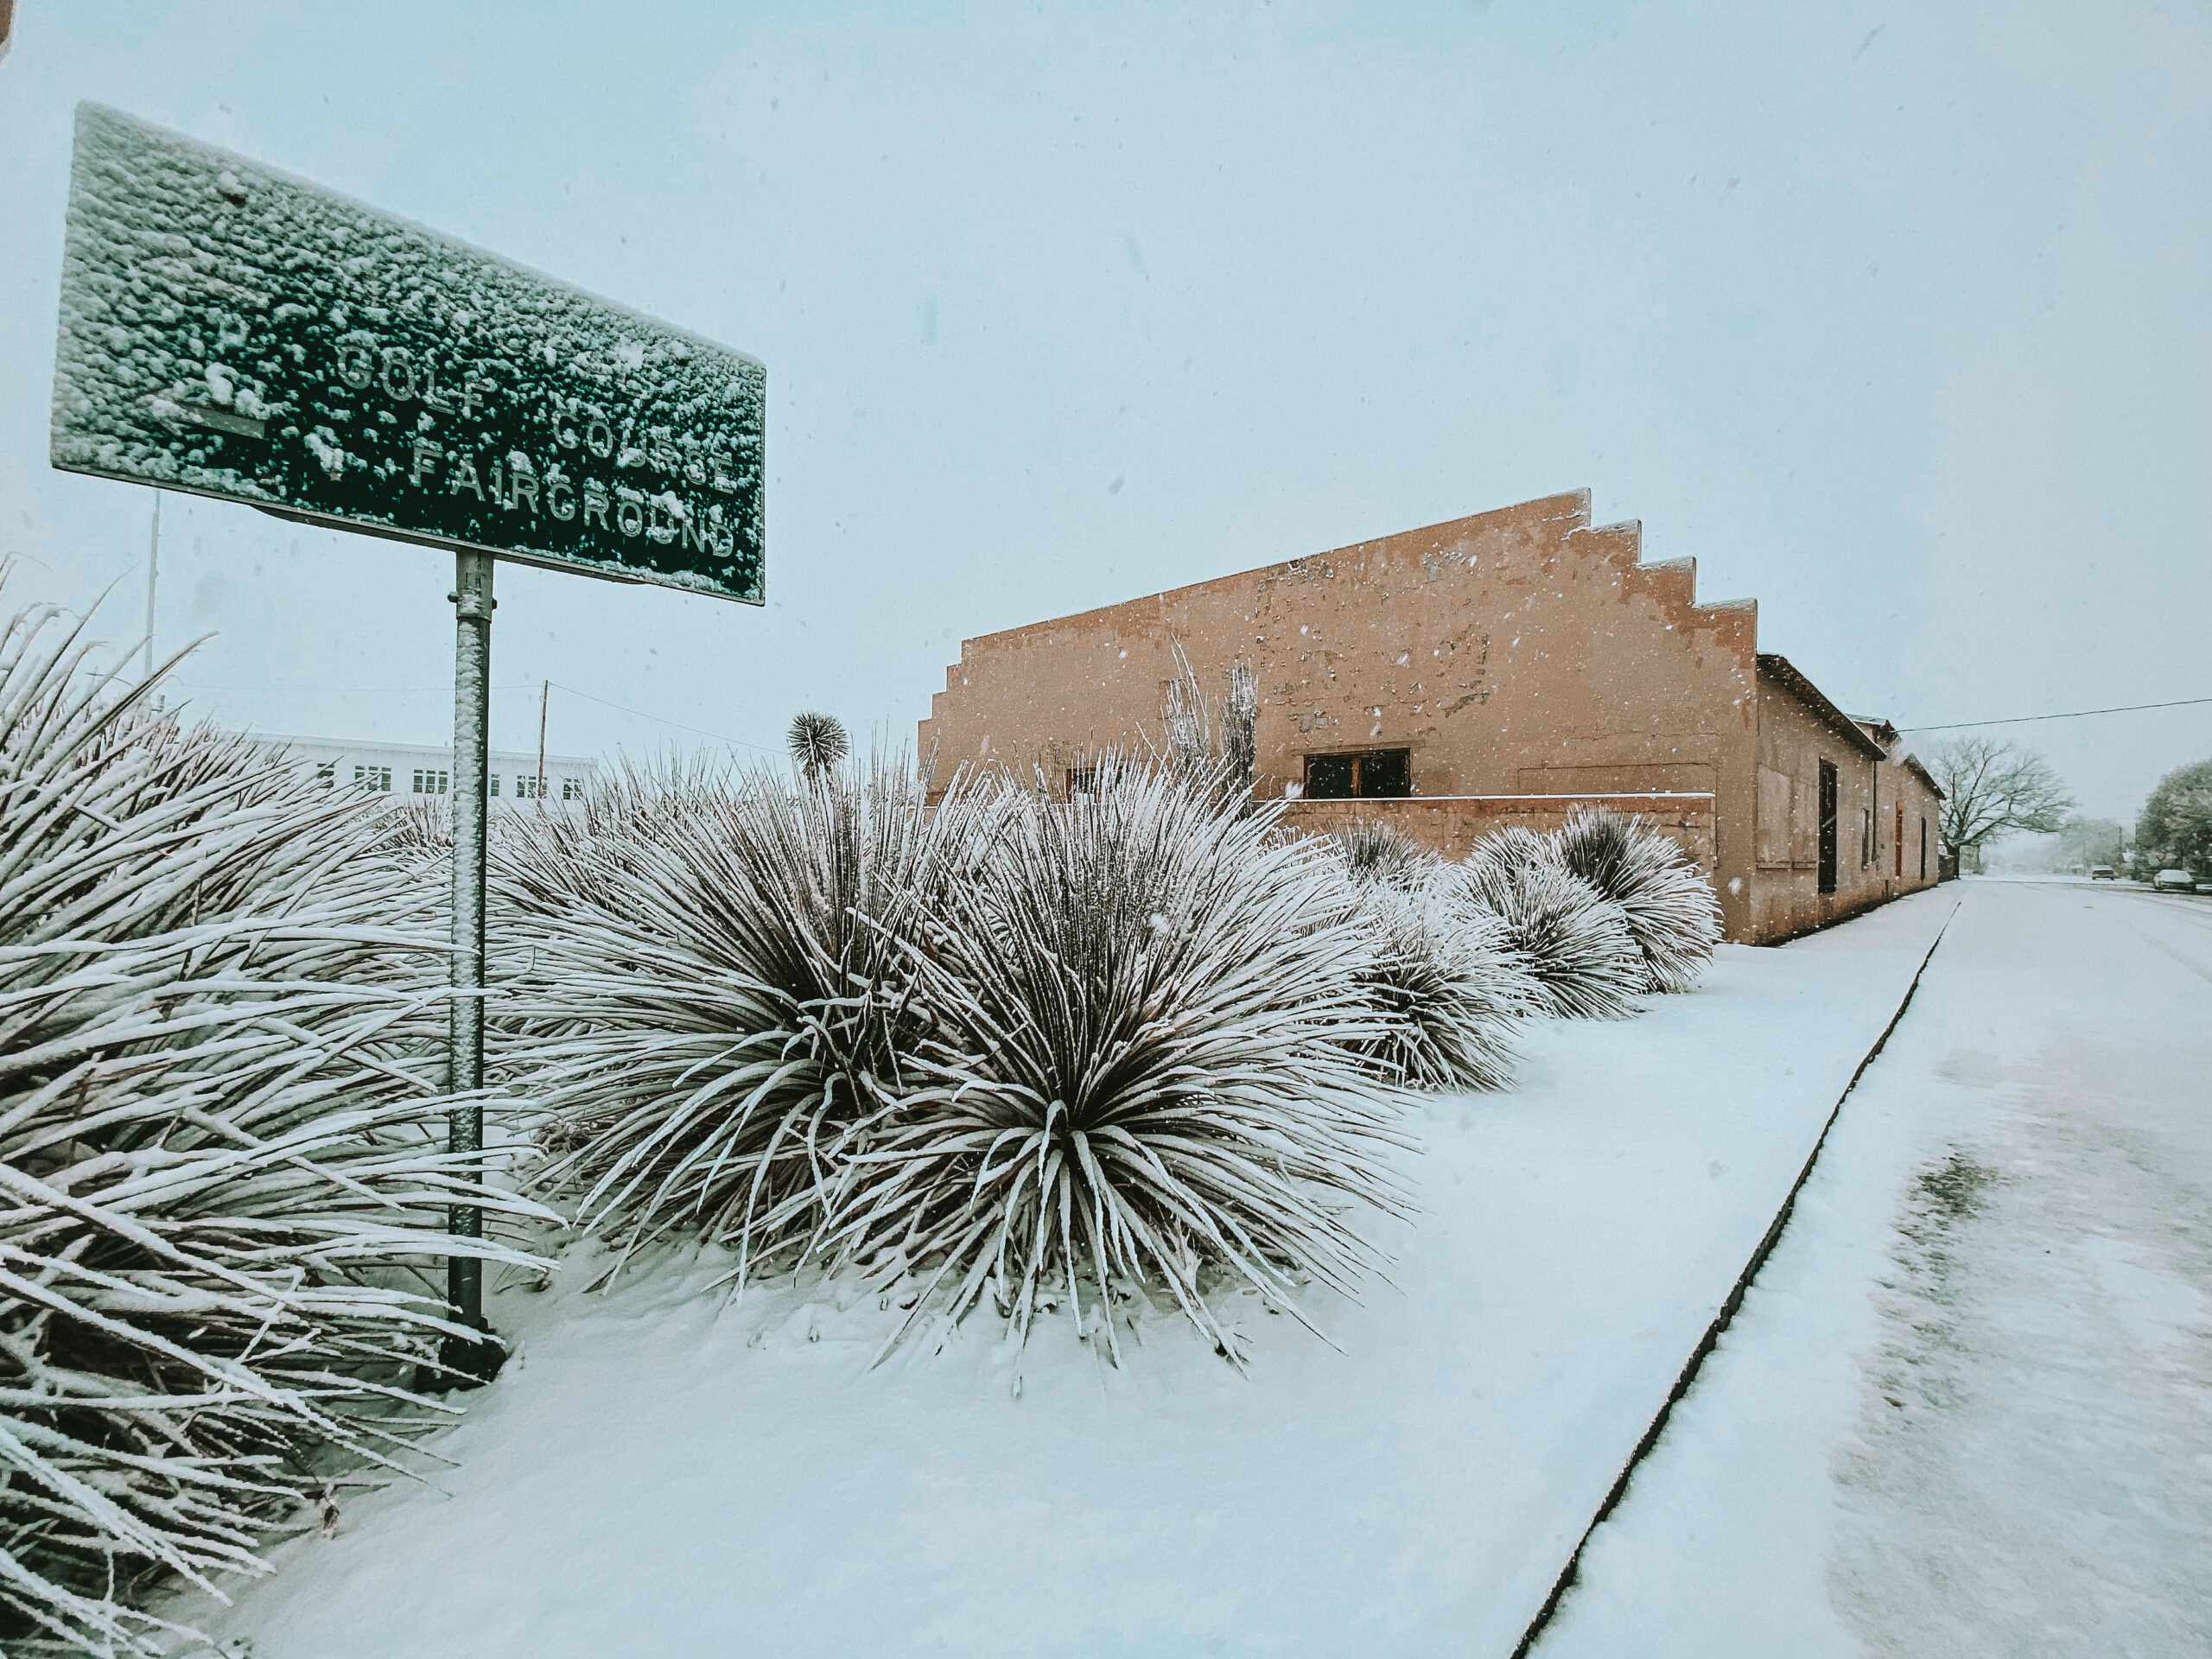 John Chamberlain building in snow